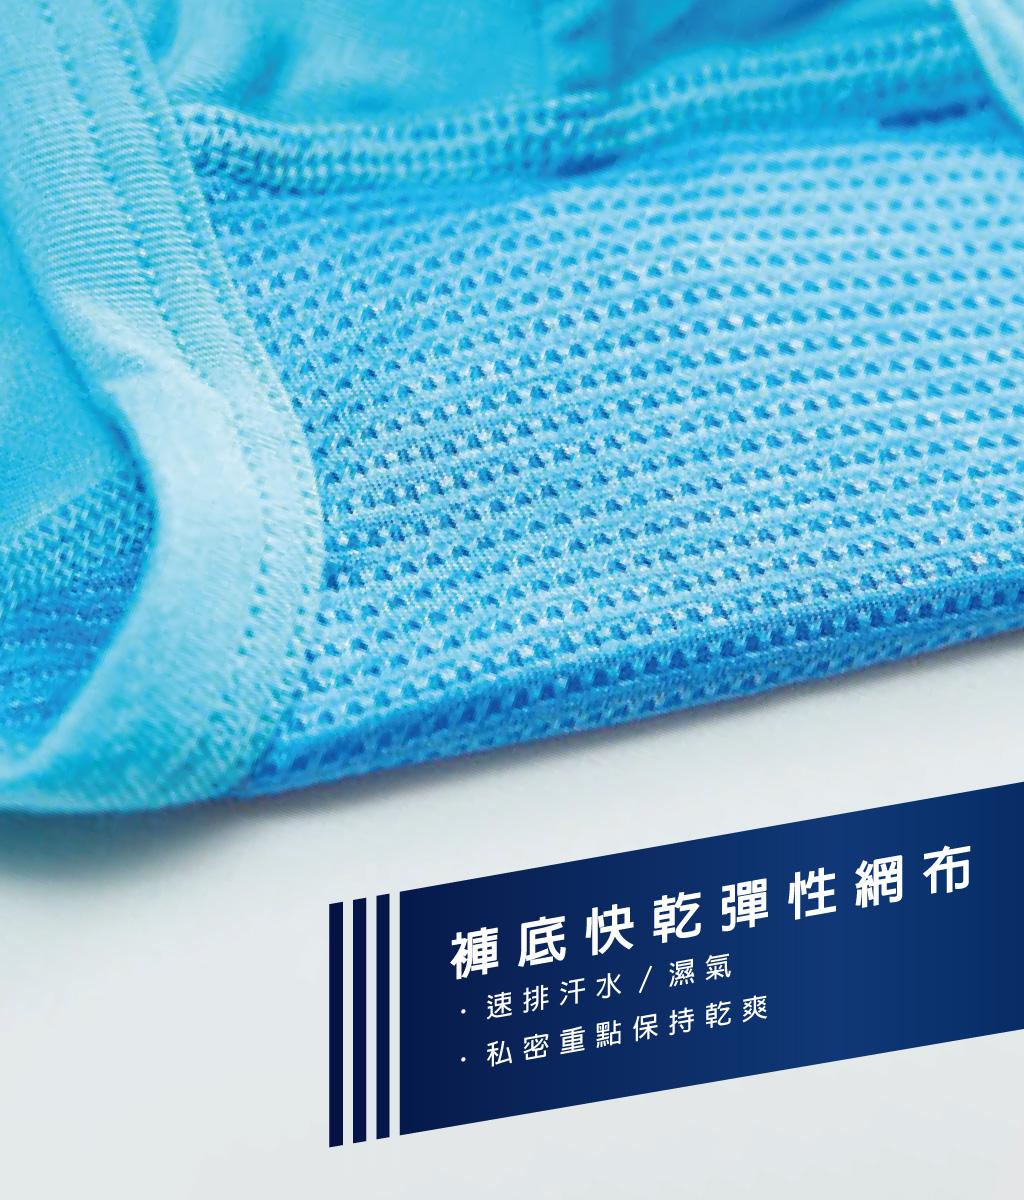 3GUN |男性時尚內衣褲MIT品牌-天翼‧能鍺AIR-透氣網眼男莫代爾棉平口褲